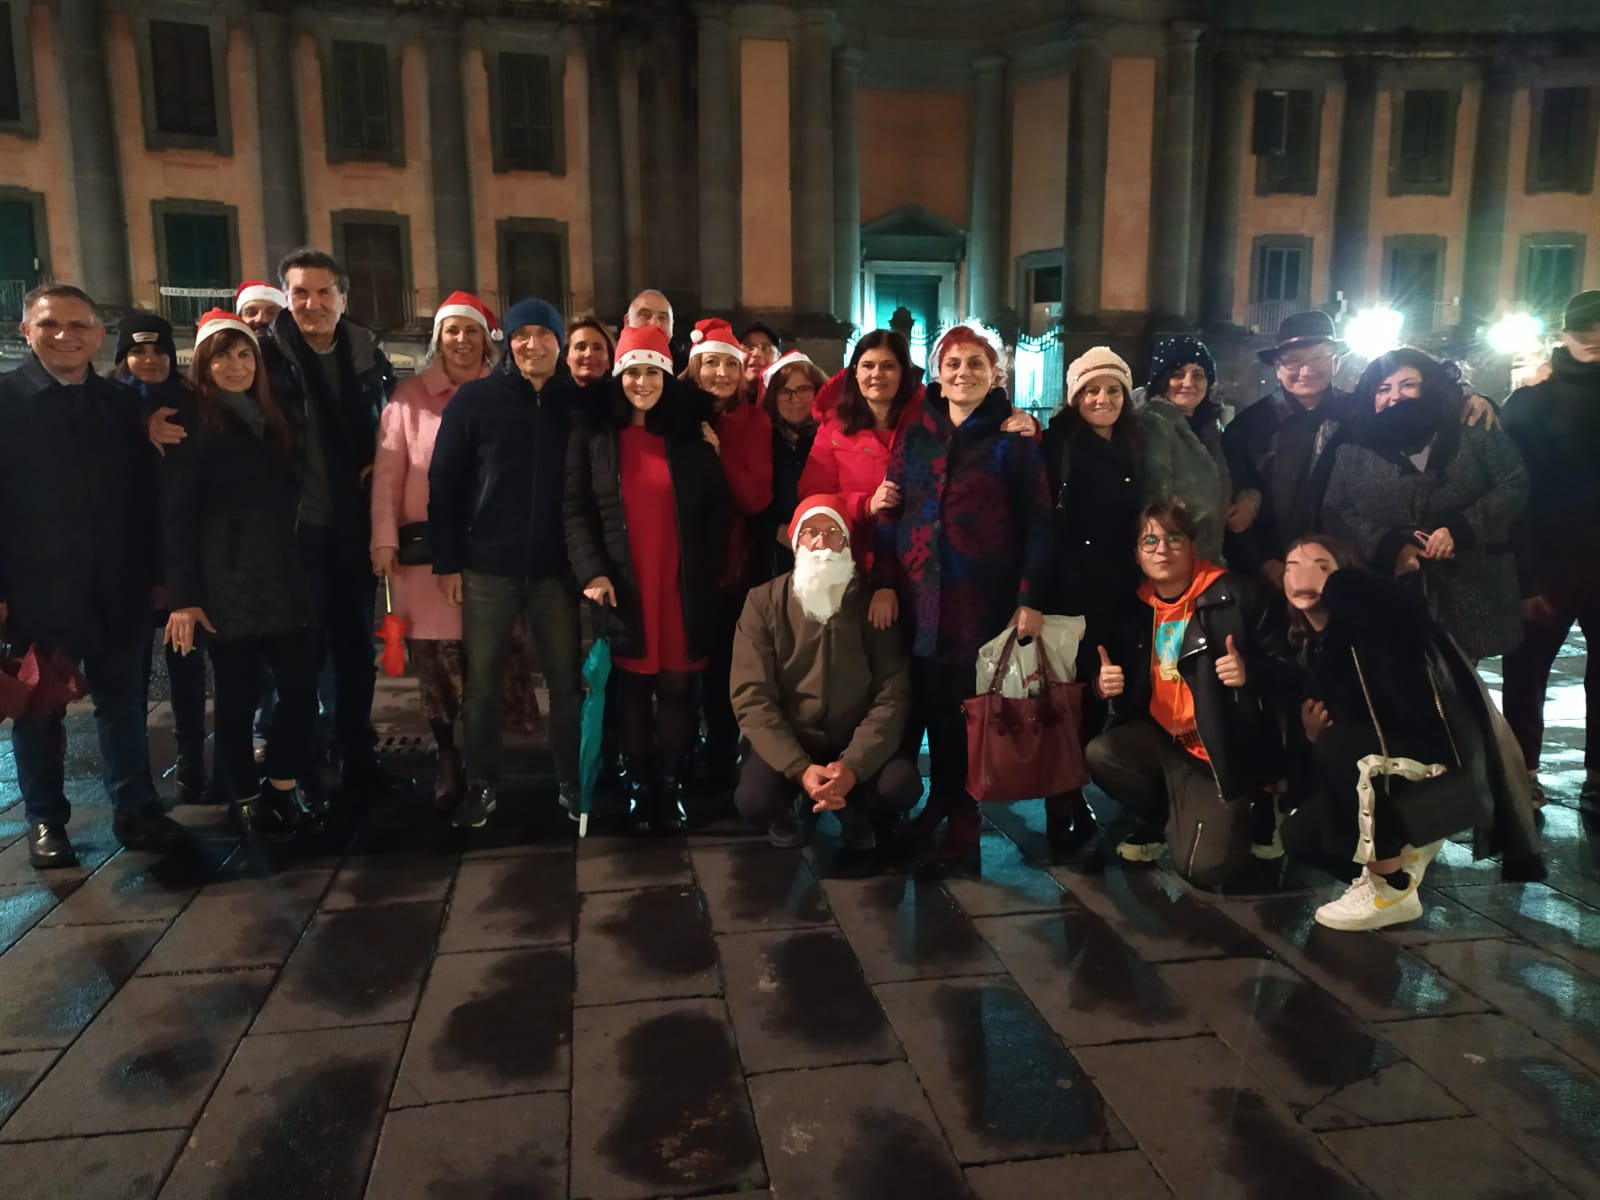 Be Christmas Time, foto di gruppo